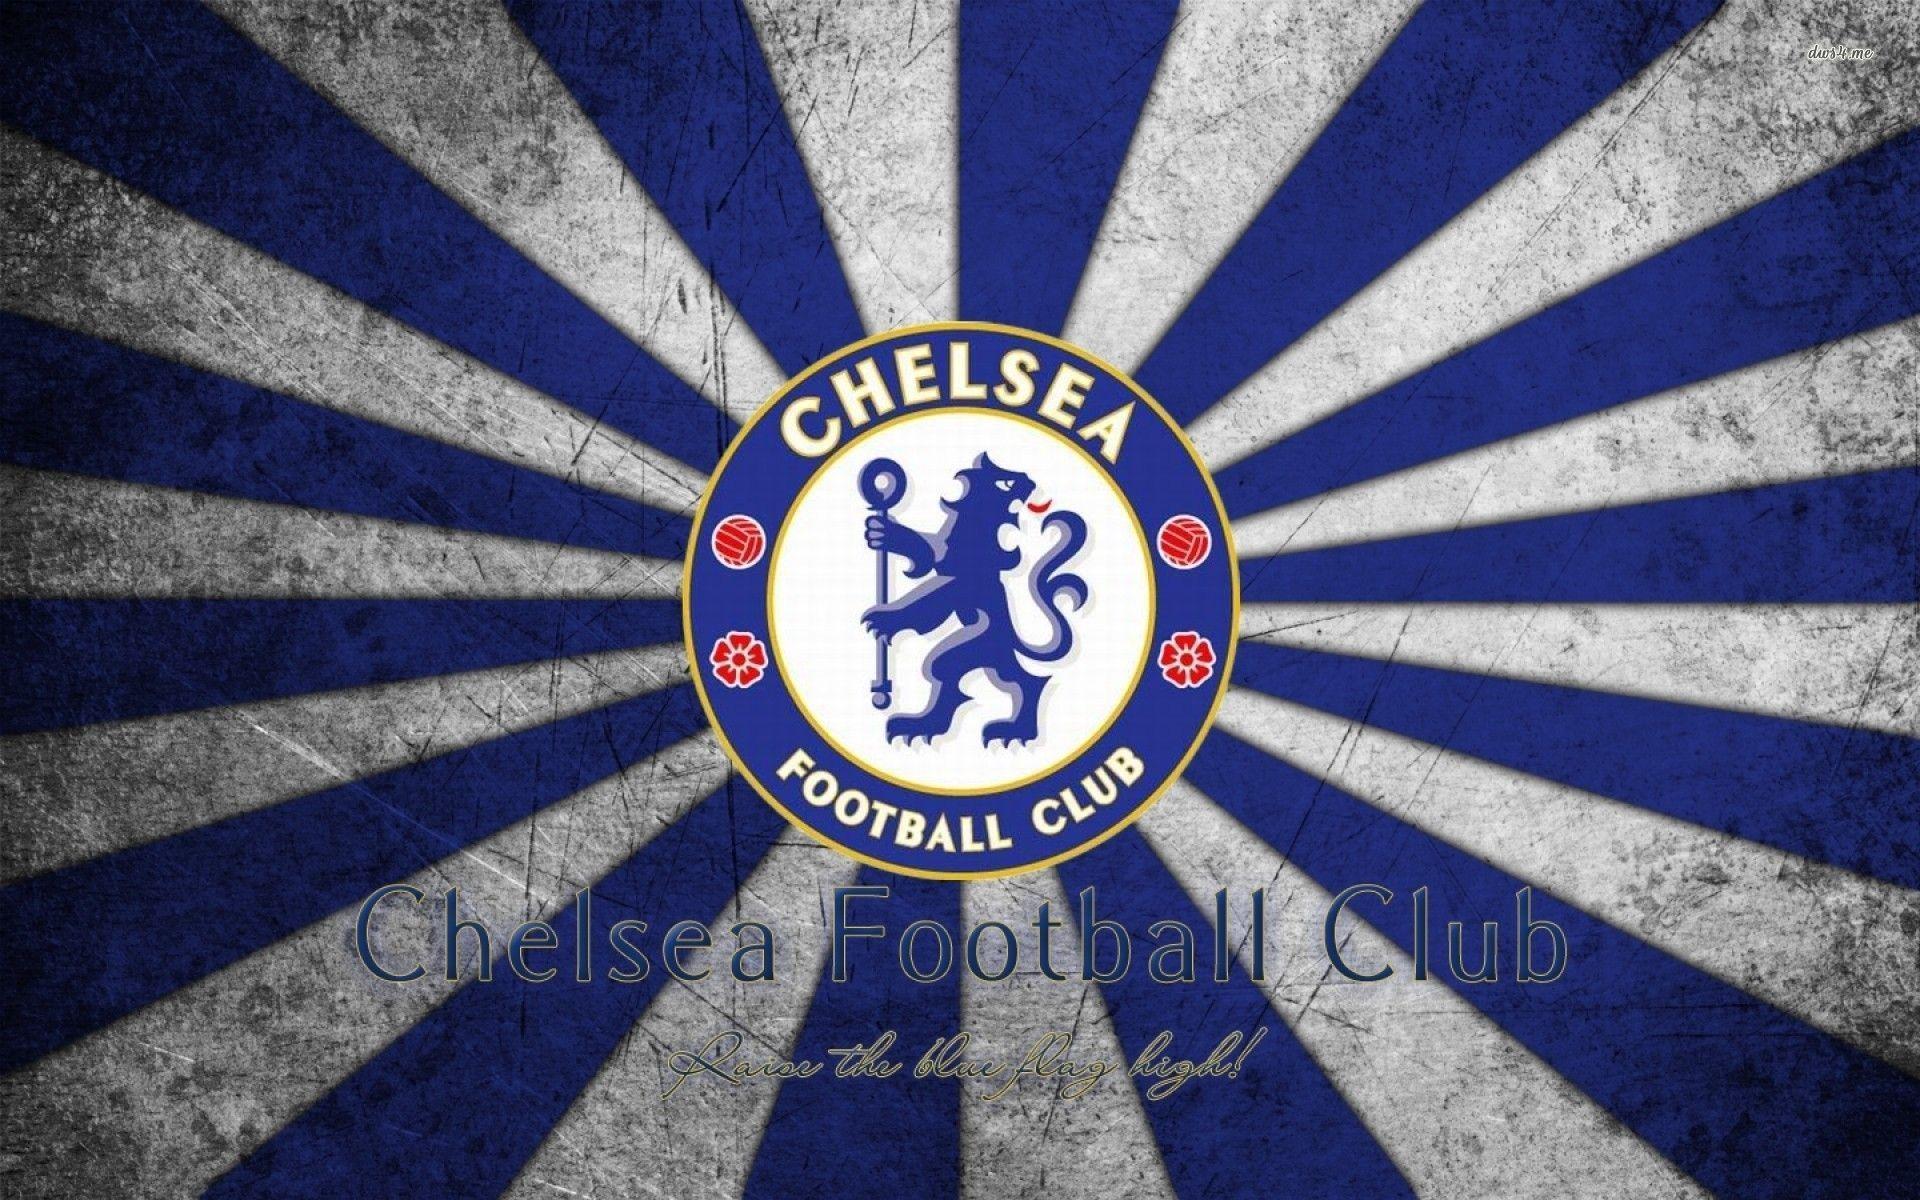 Chelsea Football Club wallpaper - 1030637